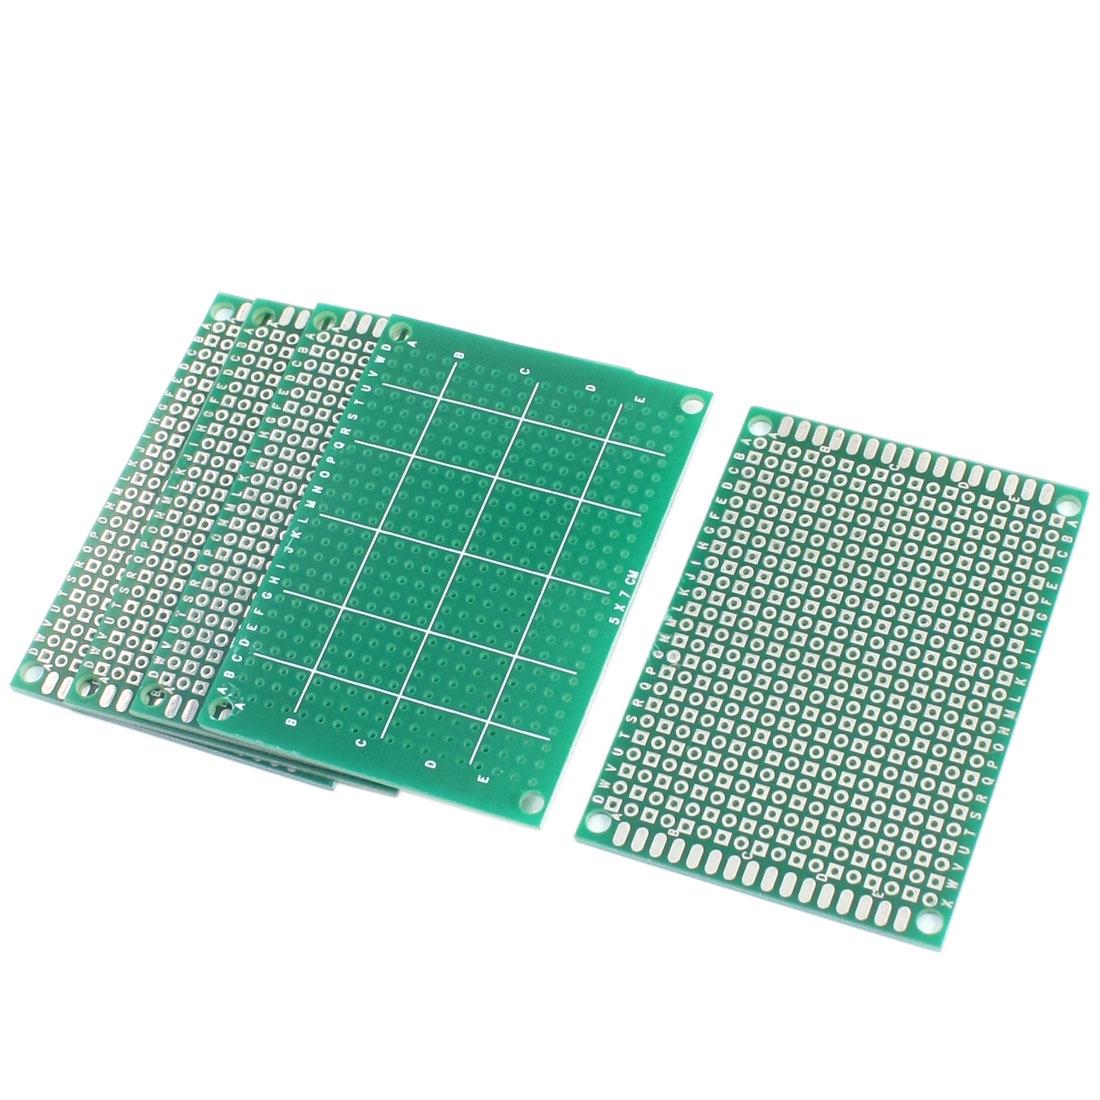 5pcs 5x7 5 x 7cm FR-4 Single Side Prototype PCB Circuit Universal Board